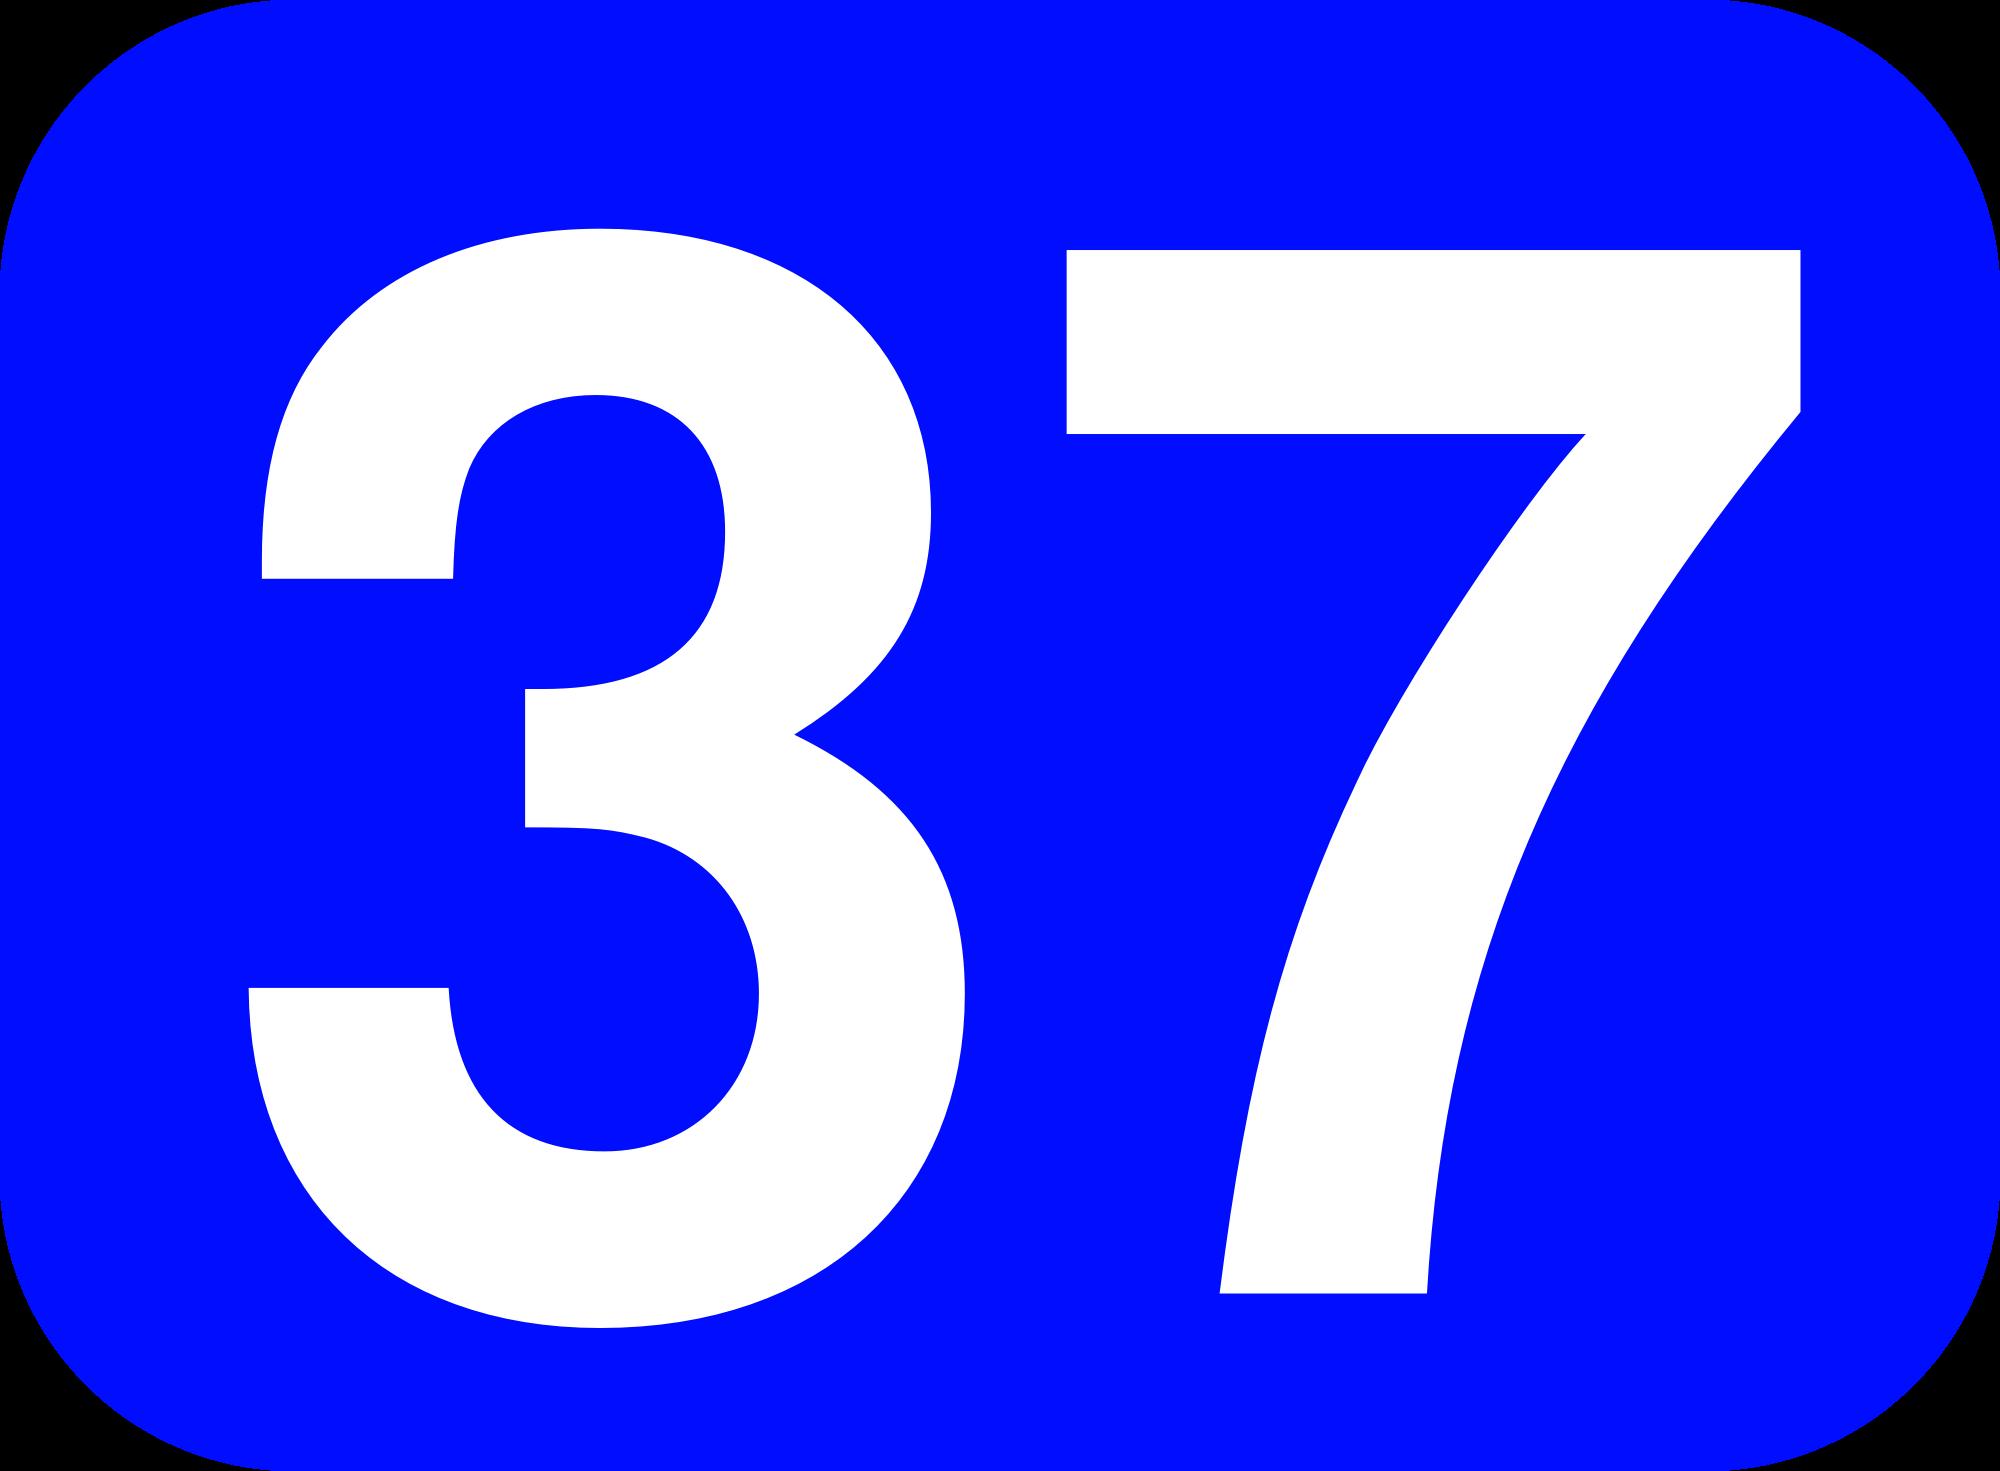 37 - Dr. Odd